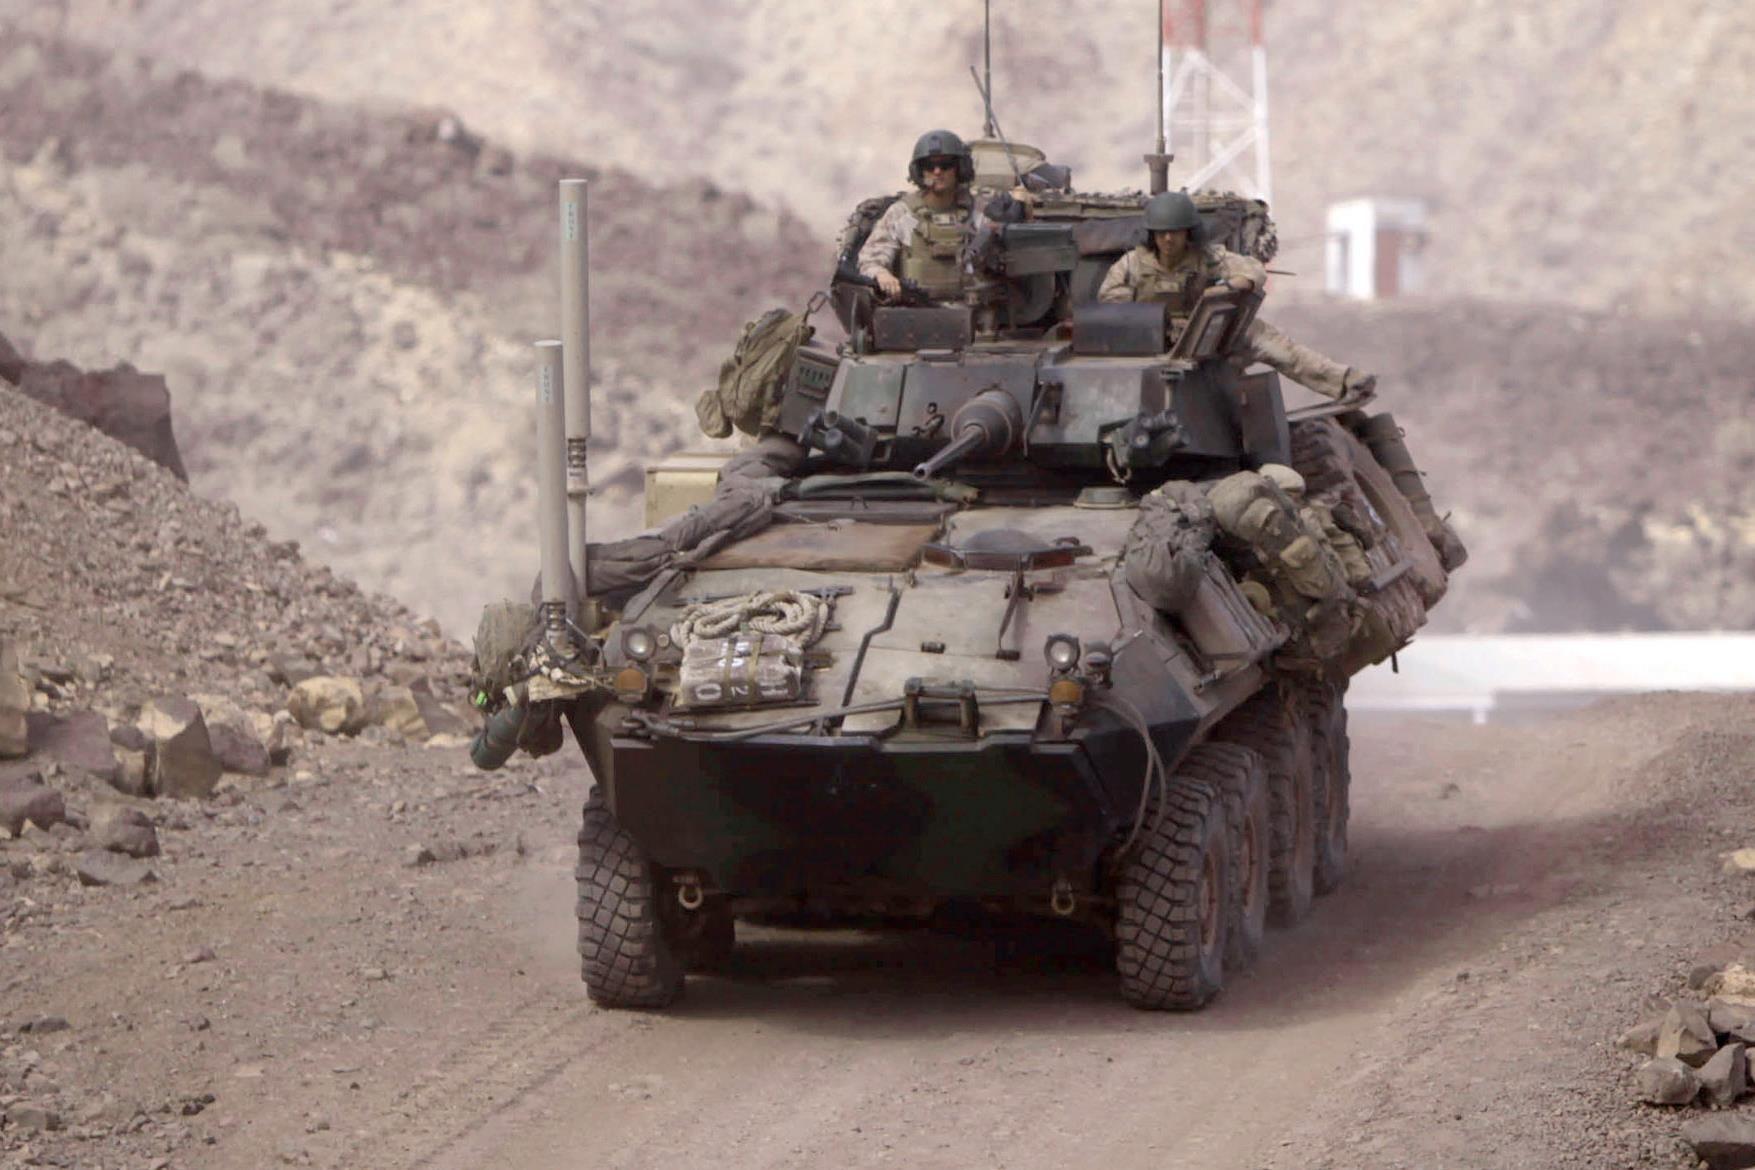 Usmc lav 25a2 8 8 vehicle military vehicle wheeled pinterest usmc military and army